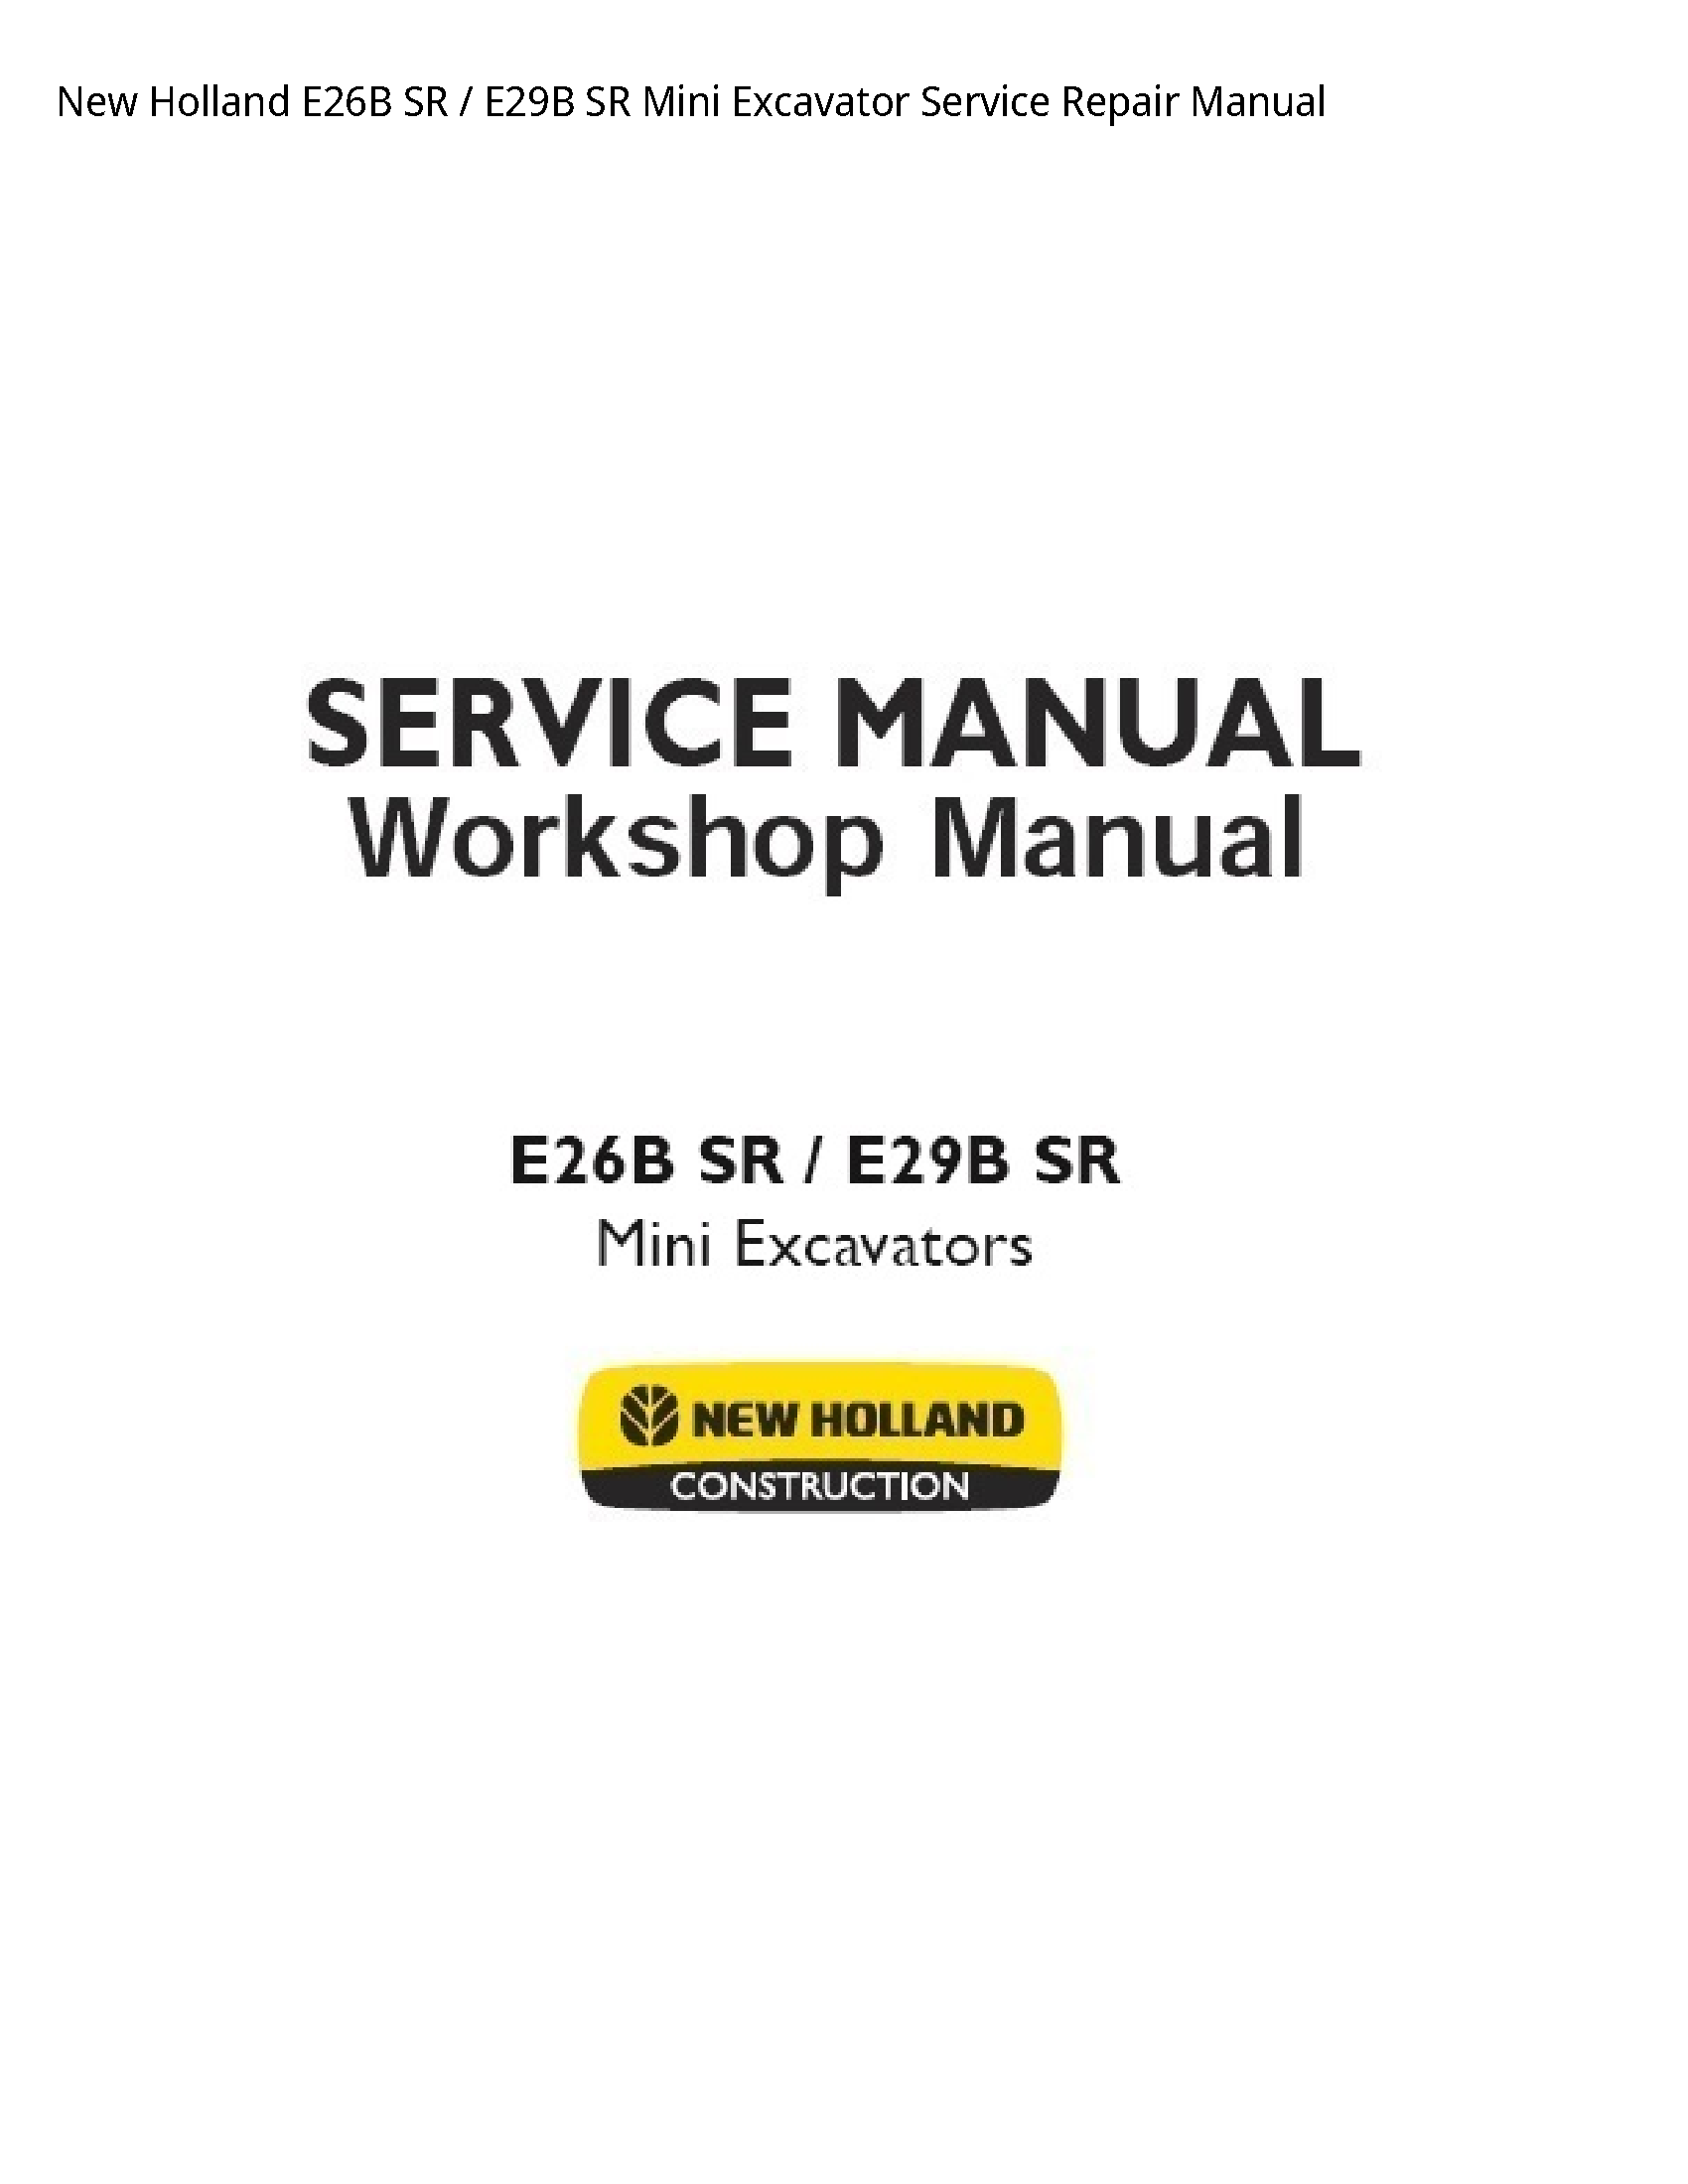 New Holland E26B SR SR Mini Excavator manual